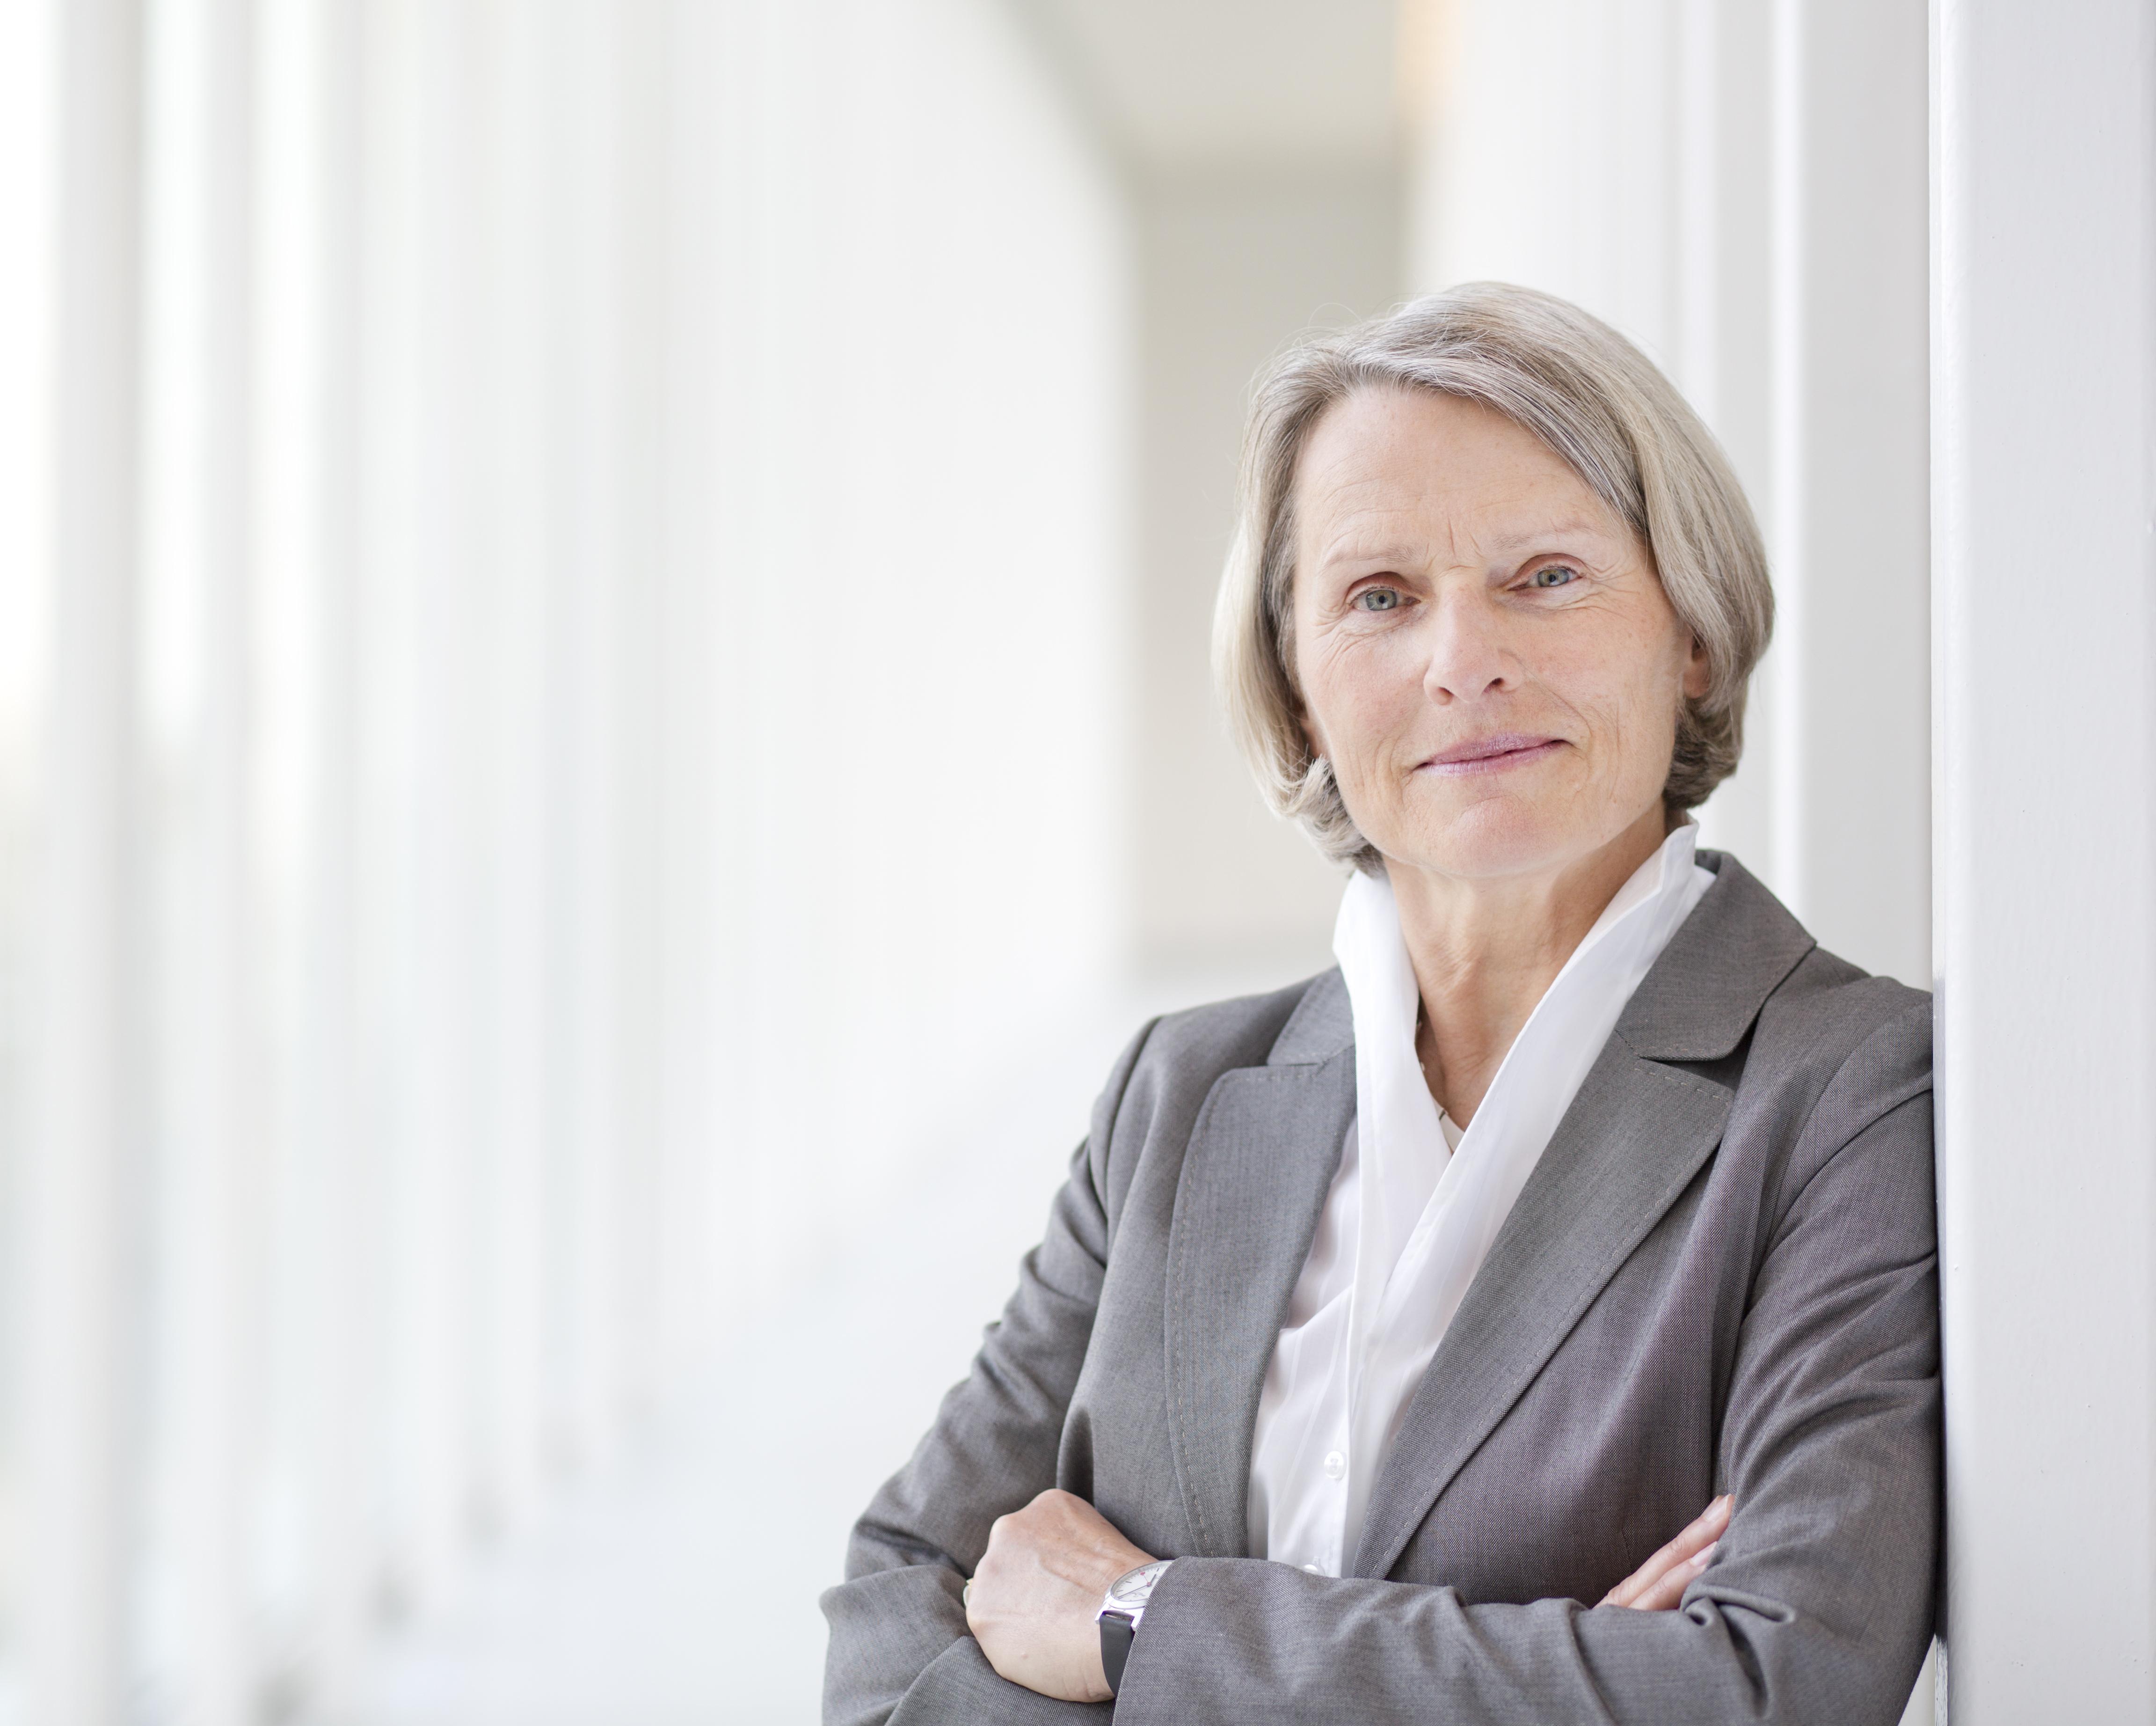 Bürgermeisterin Dr. Ulrike Freundlieb   Foto: Stadt Mannheim